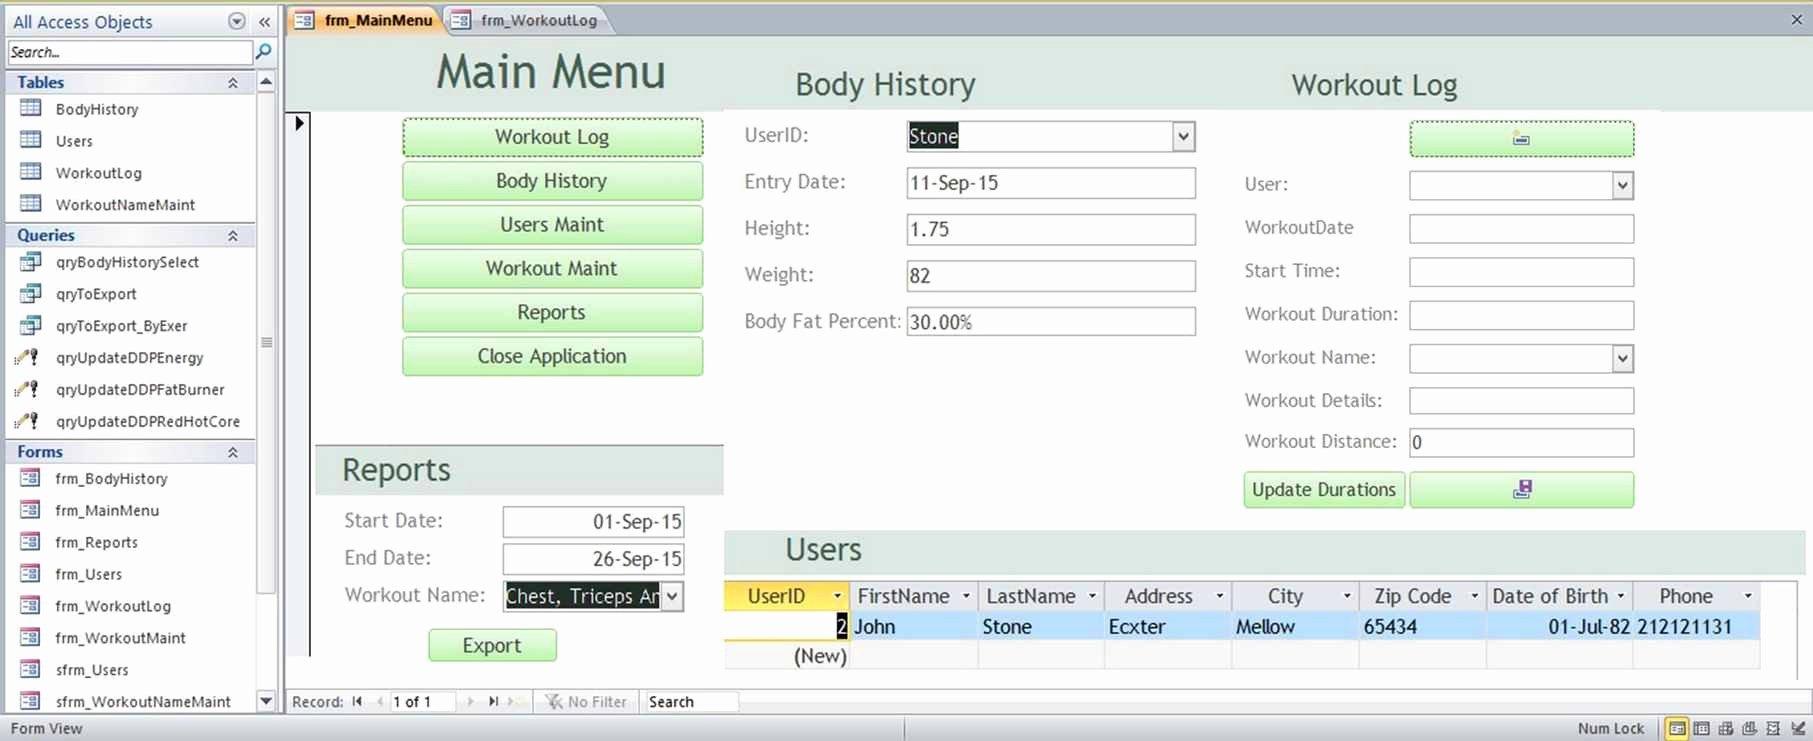 Microsoft Access Templates New Microsoft Access Family Tree Genealogy History Templates